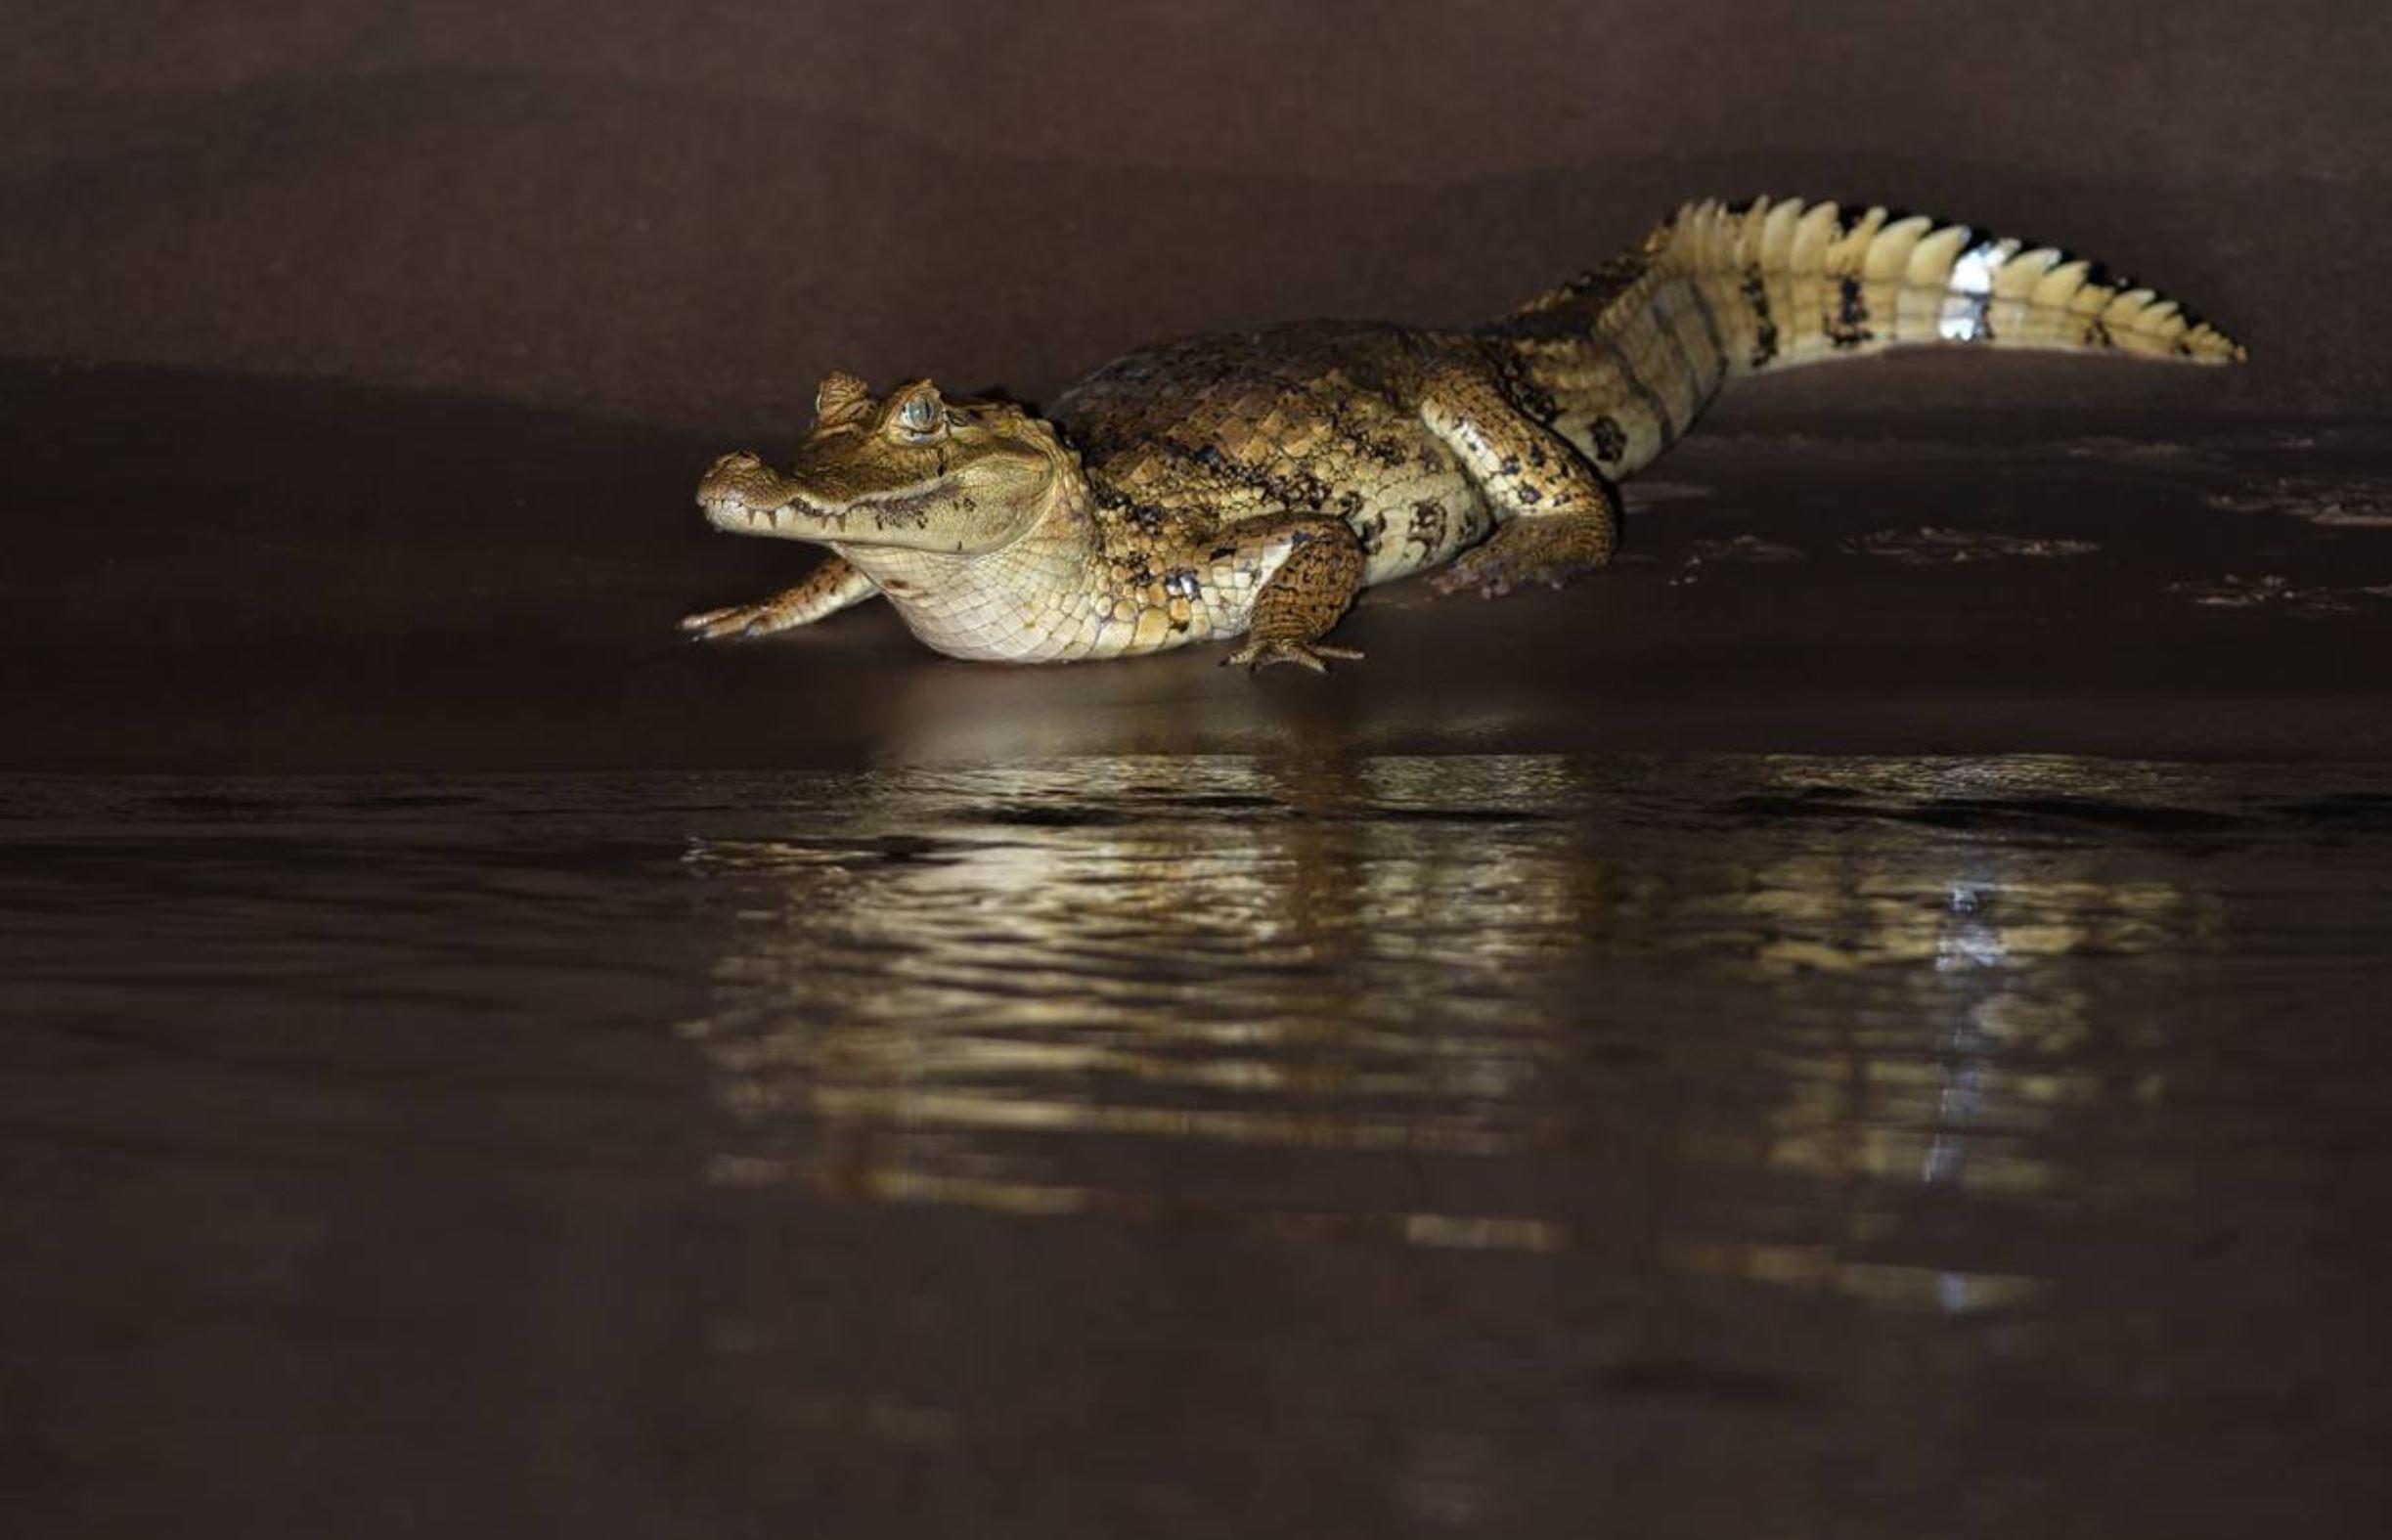 Spectacled Caiman - Photo: Alfredo Fernandez